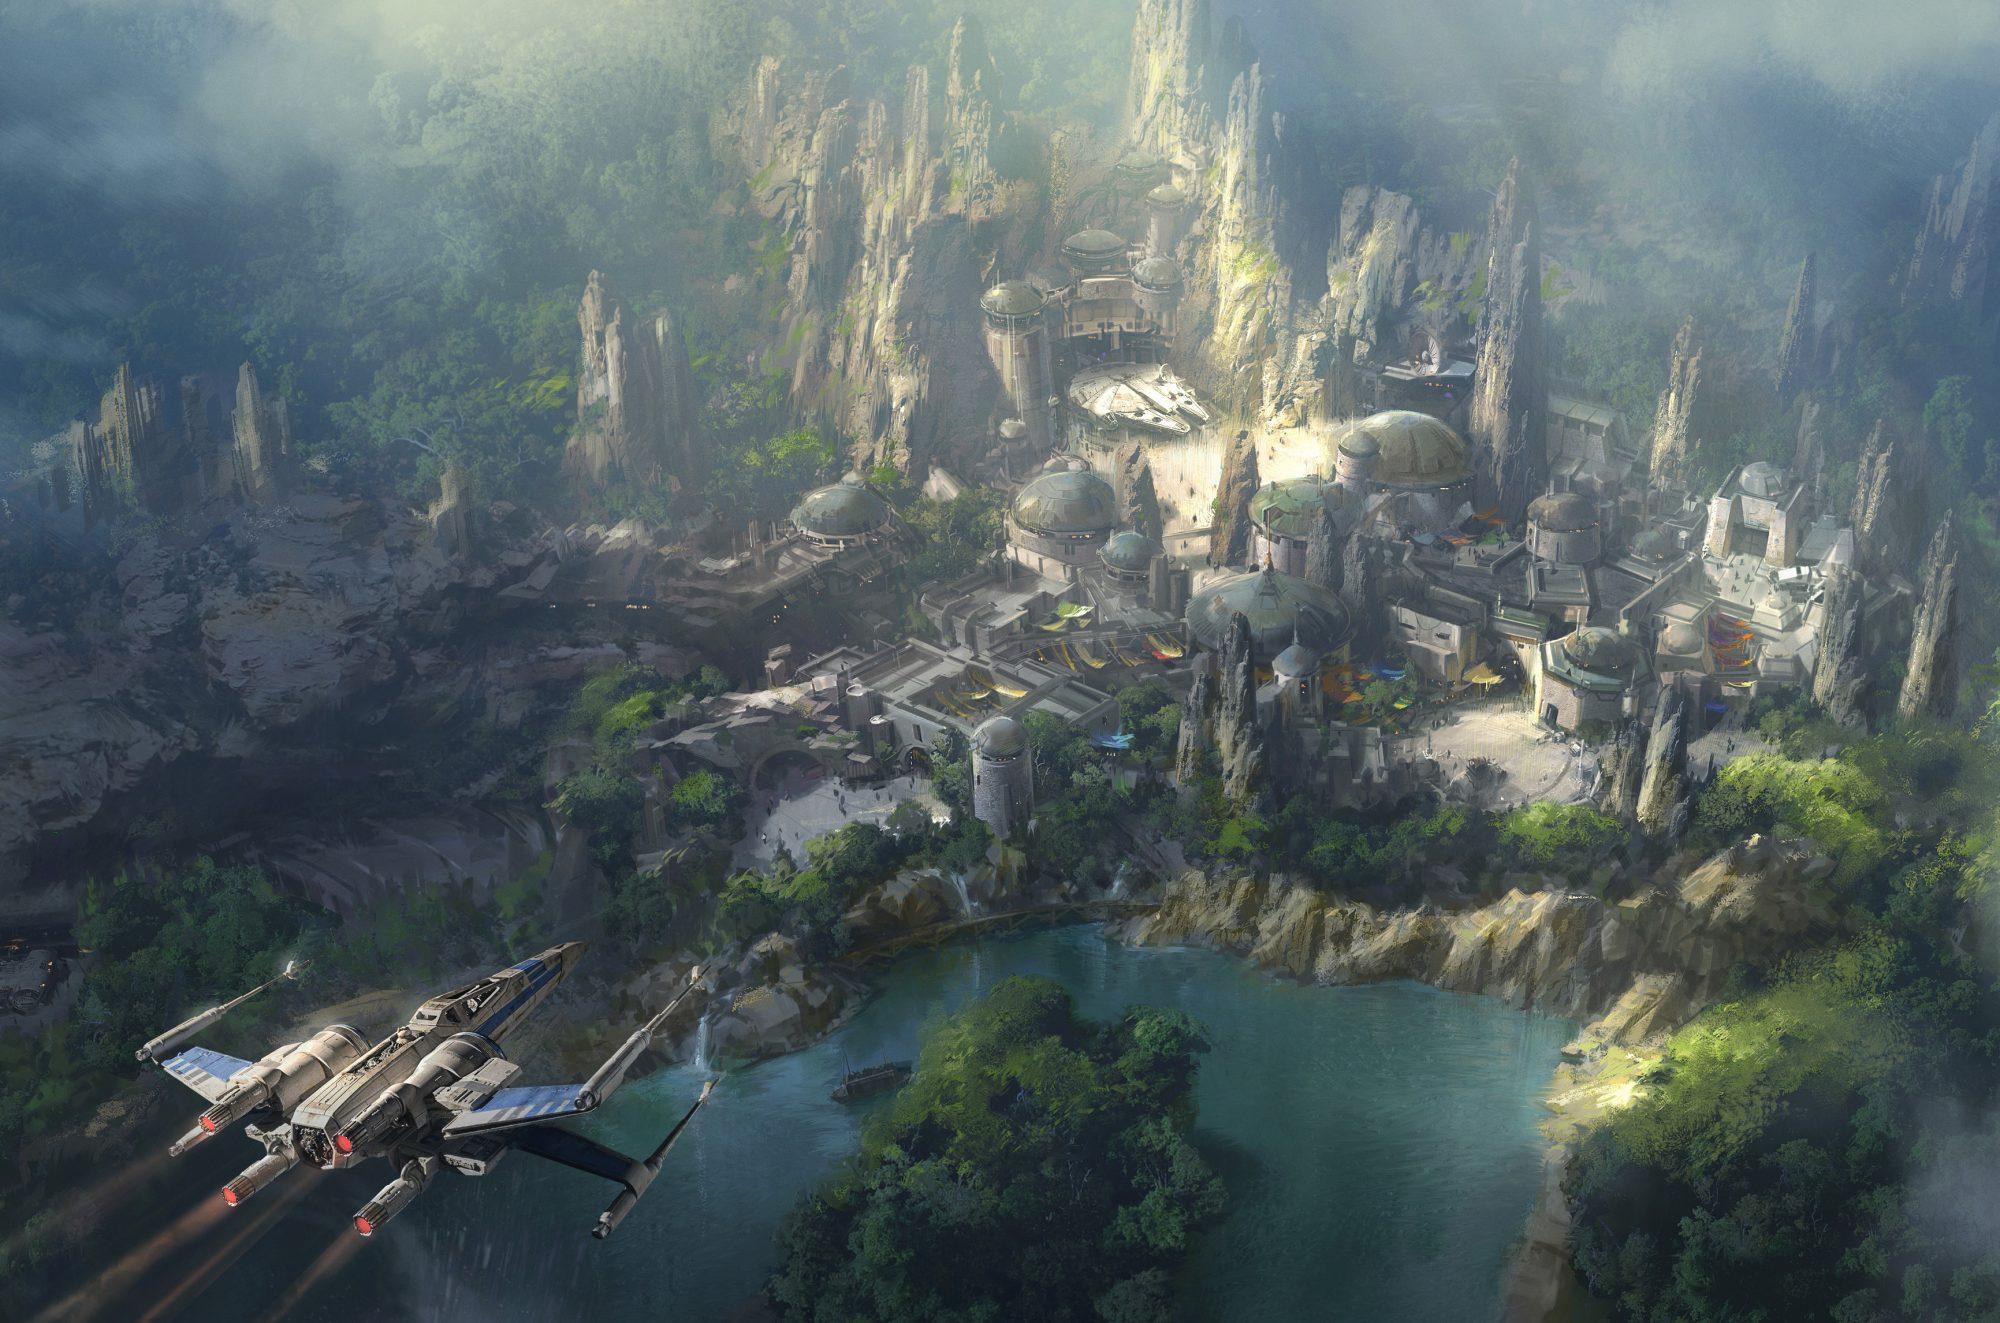 Star Wars-Themed Land At Disneyland Resort